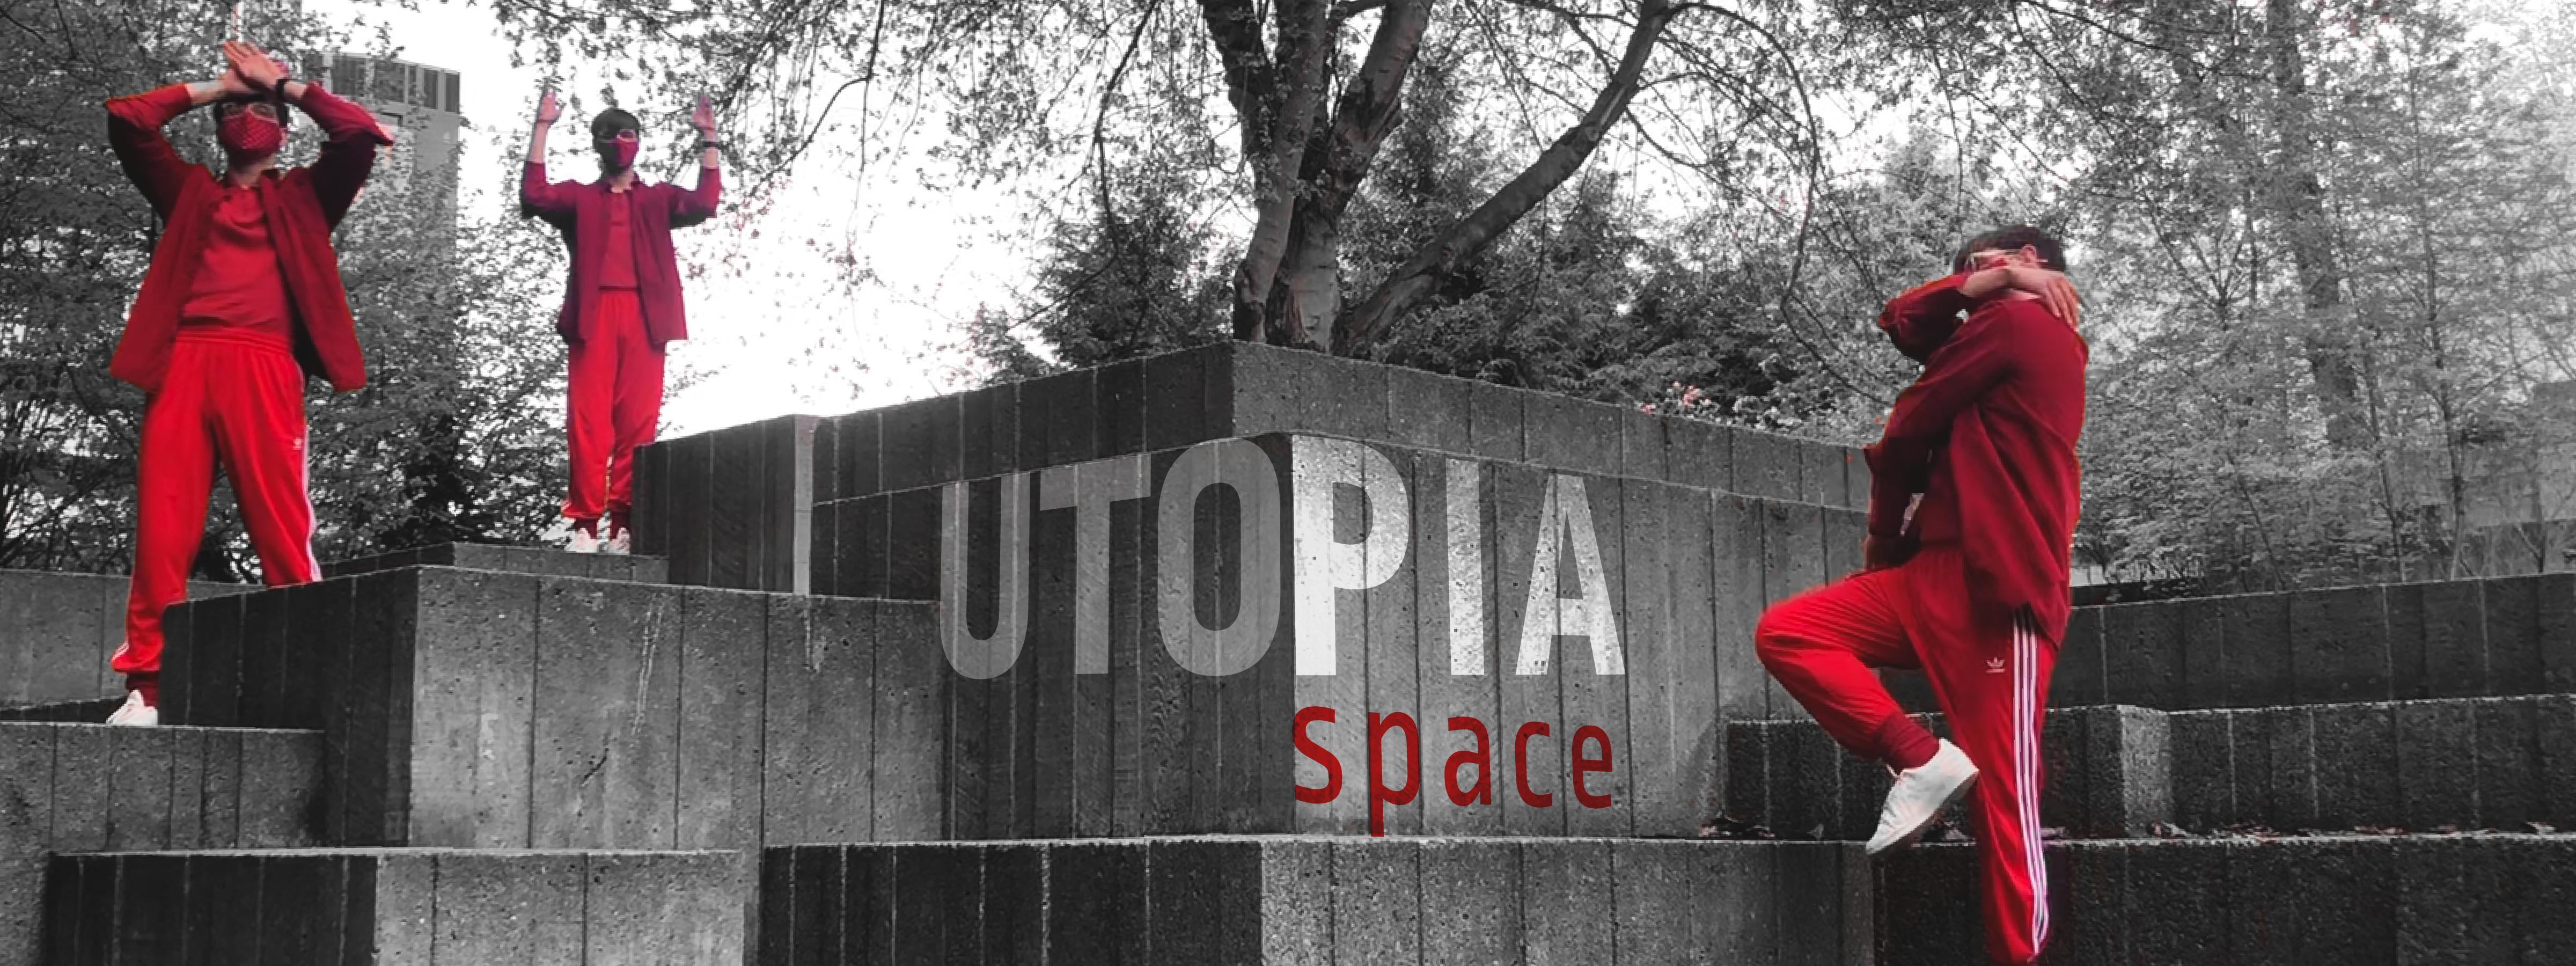 UTOPIA: space